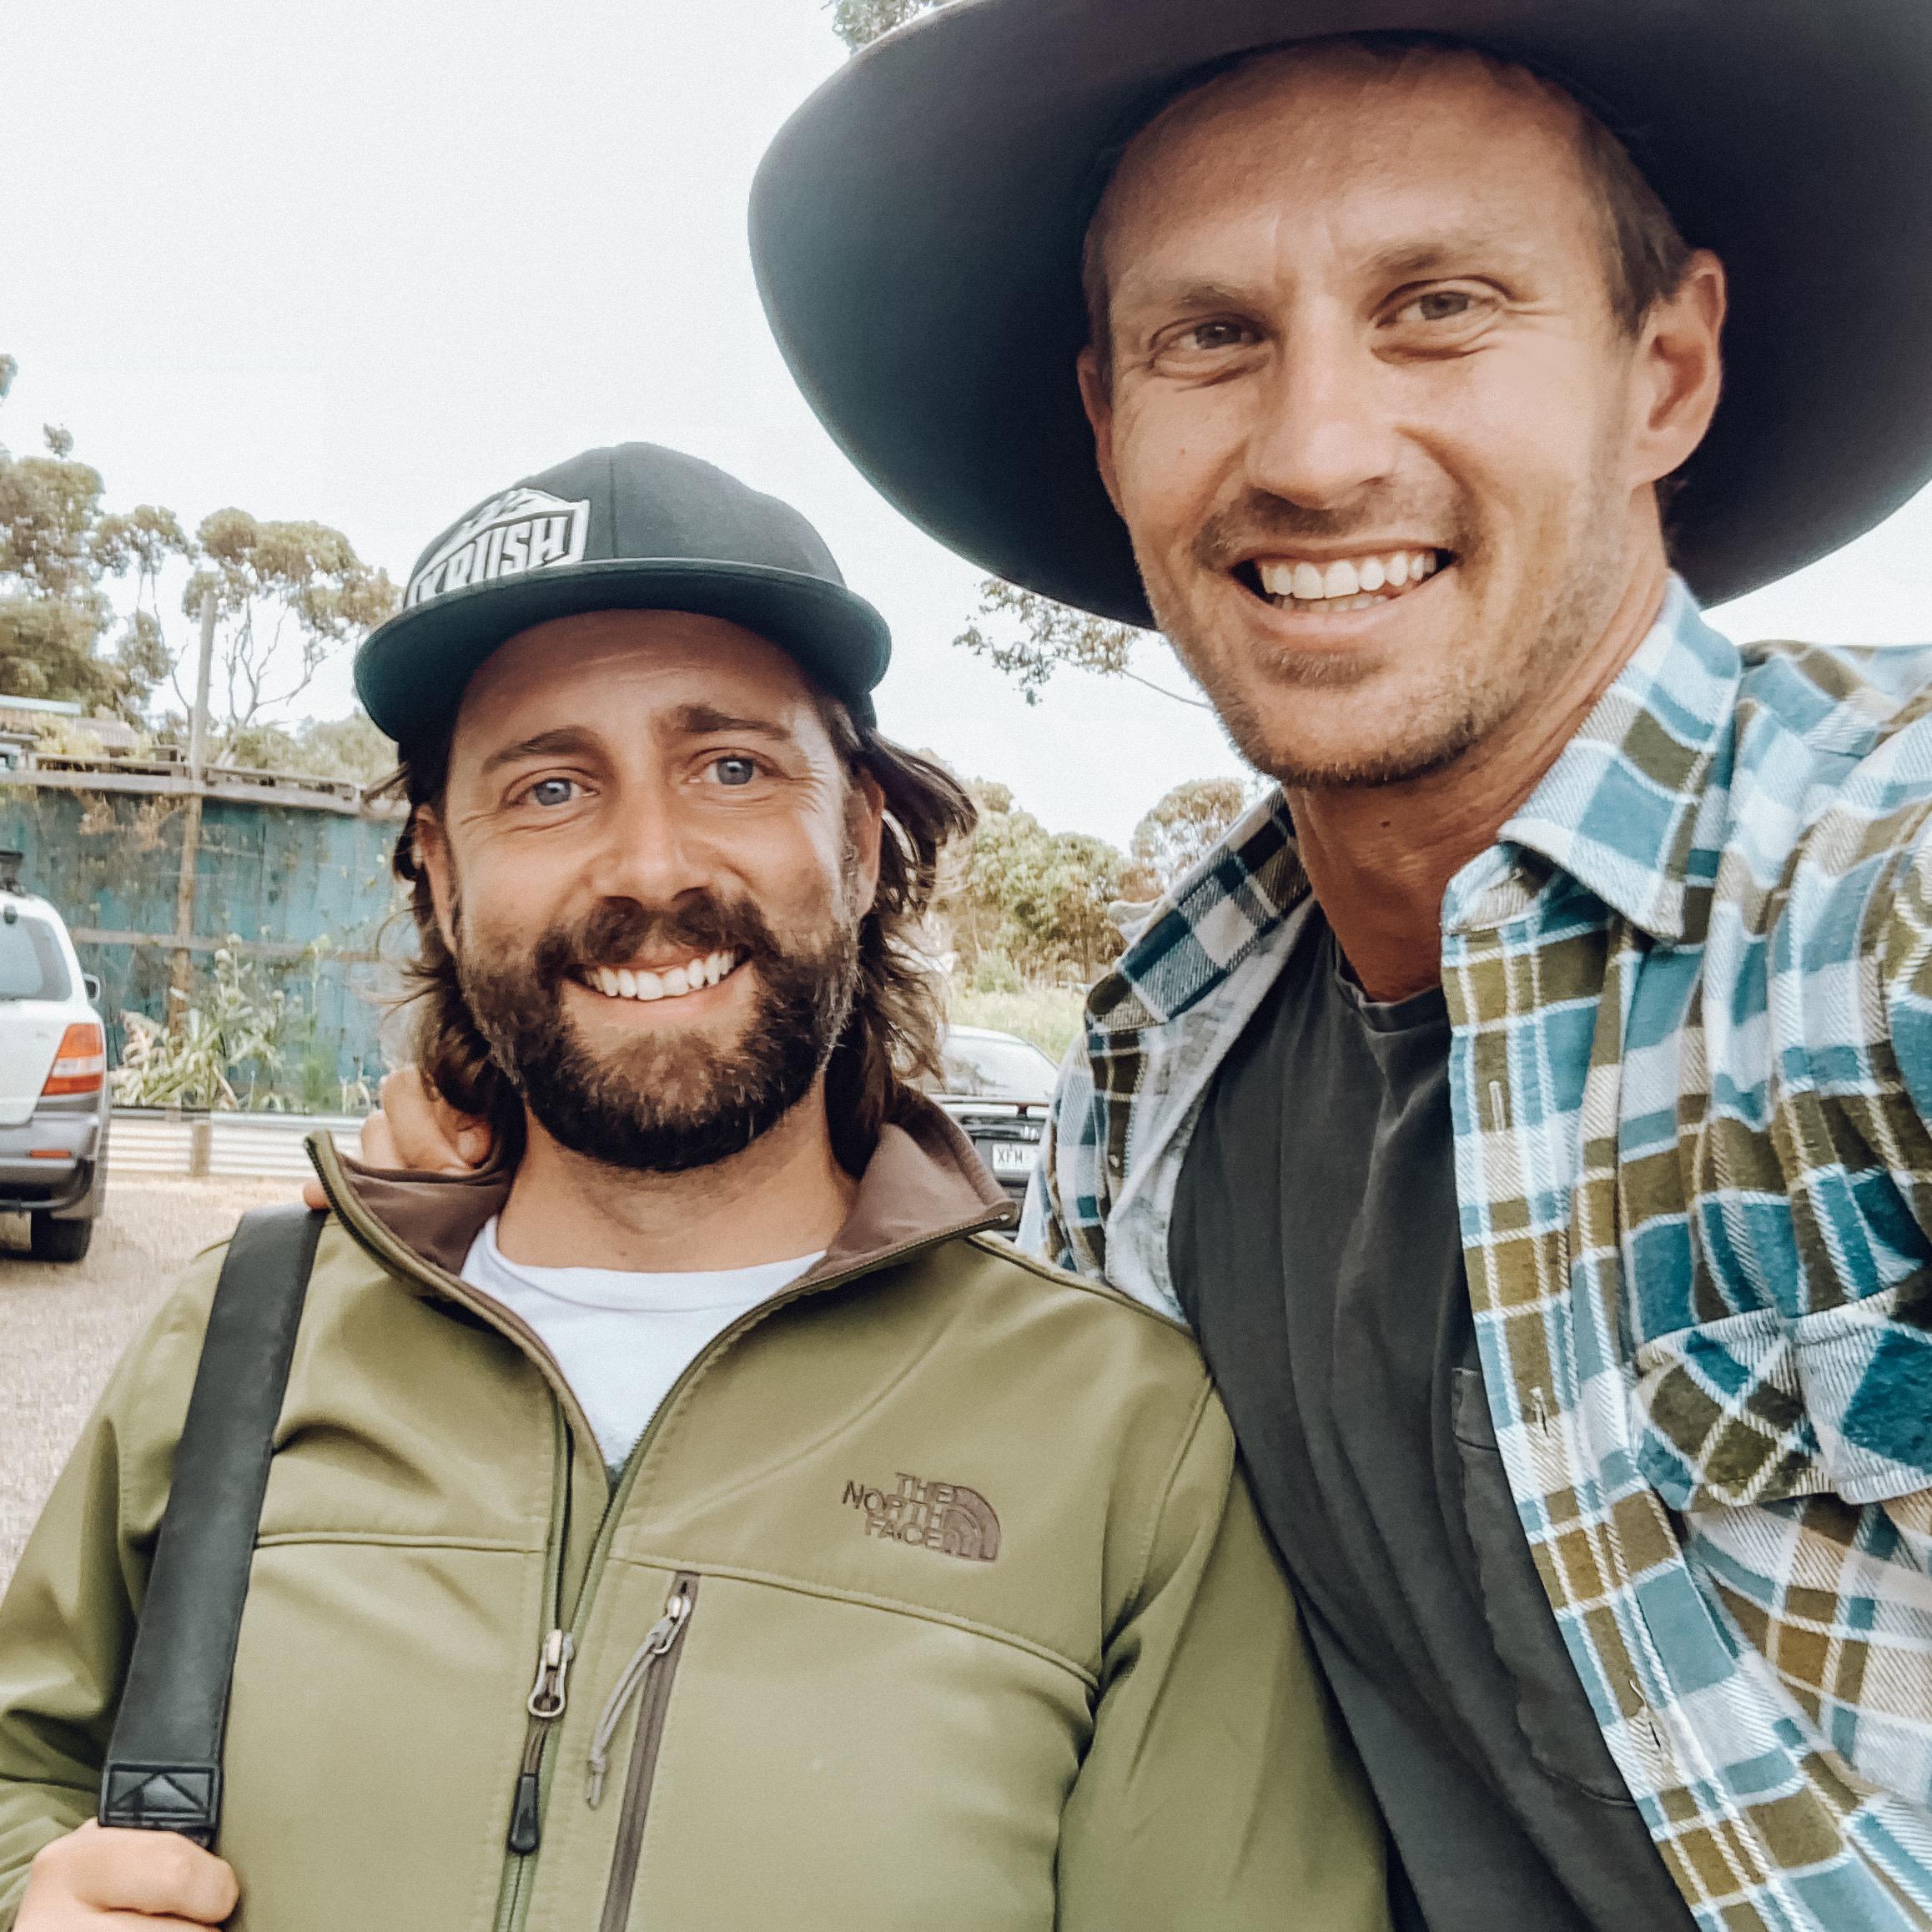 Brendan Batty (left) Exploring Eden Media